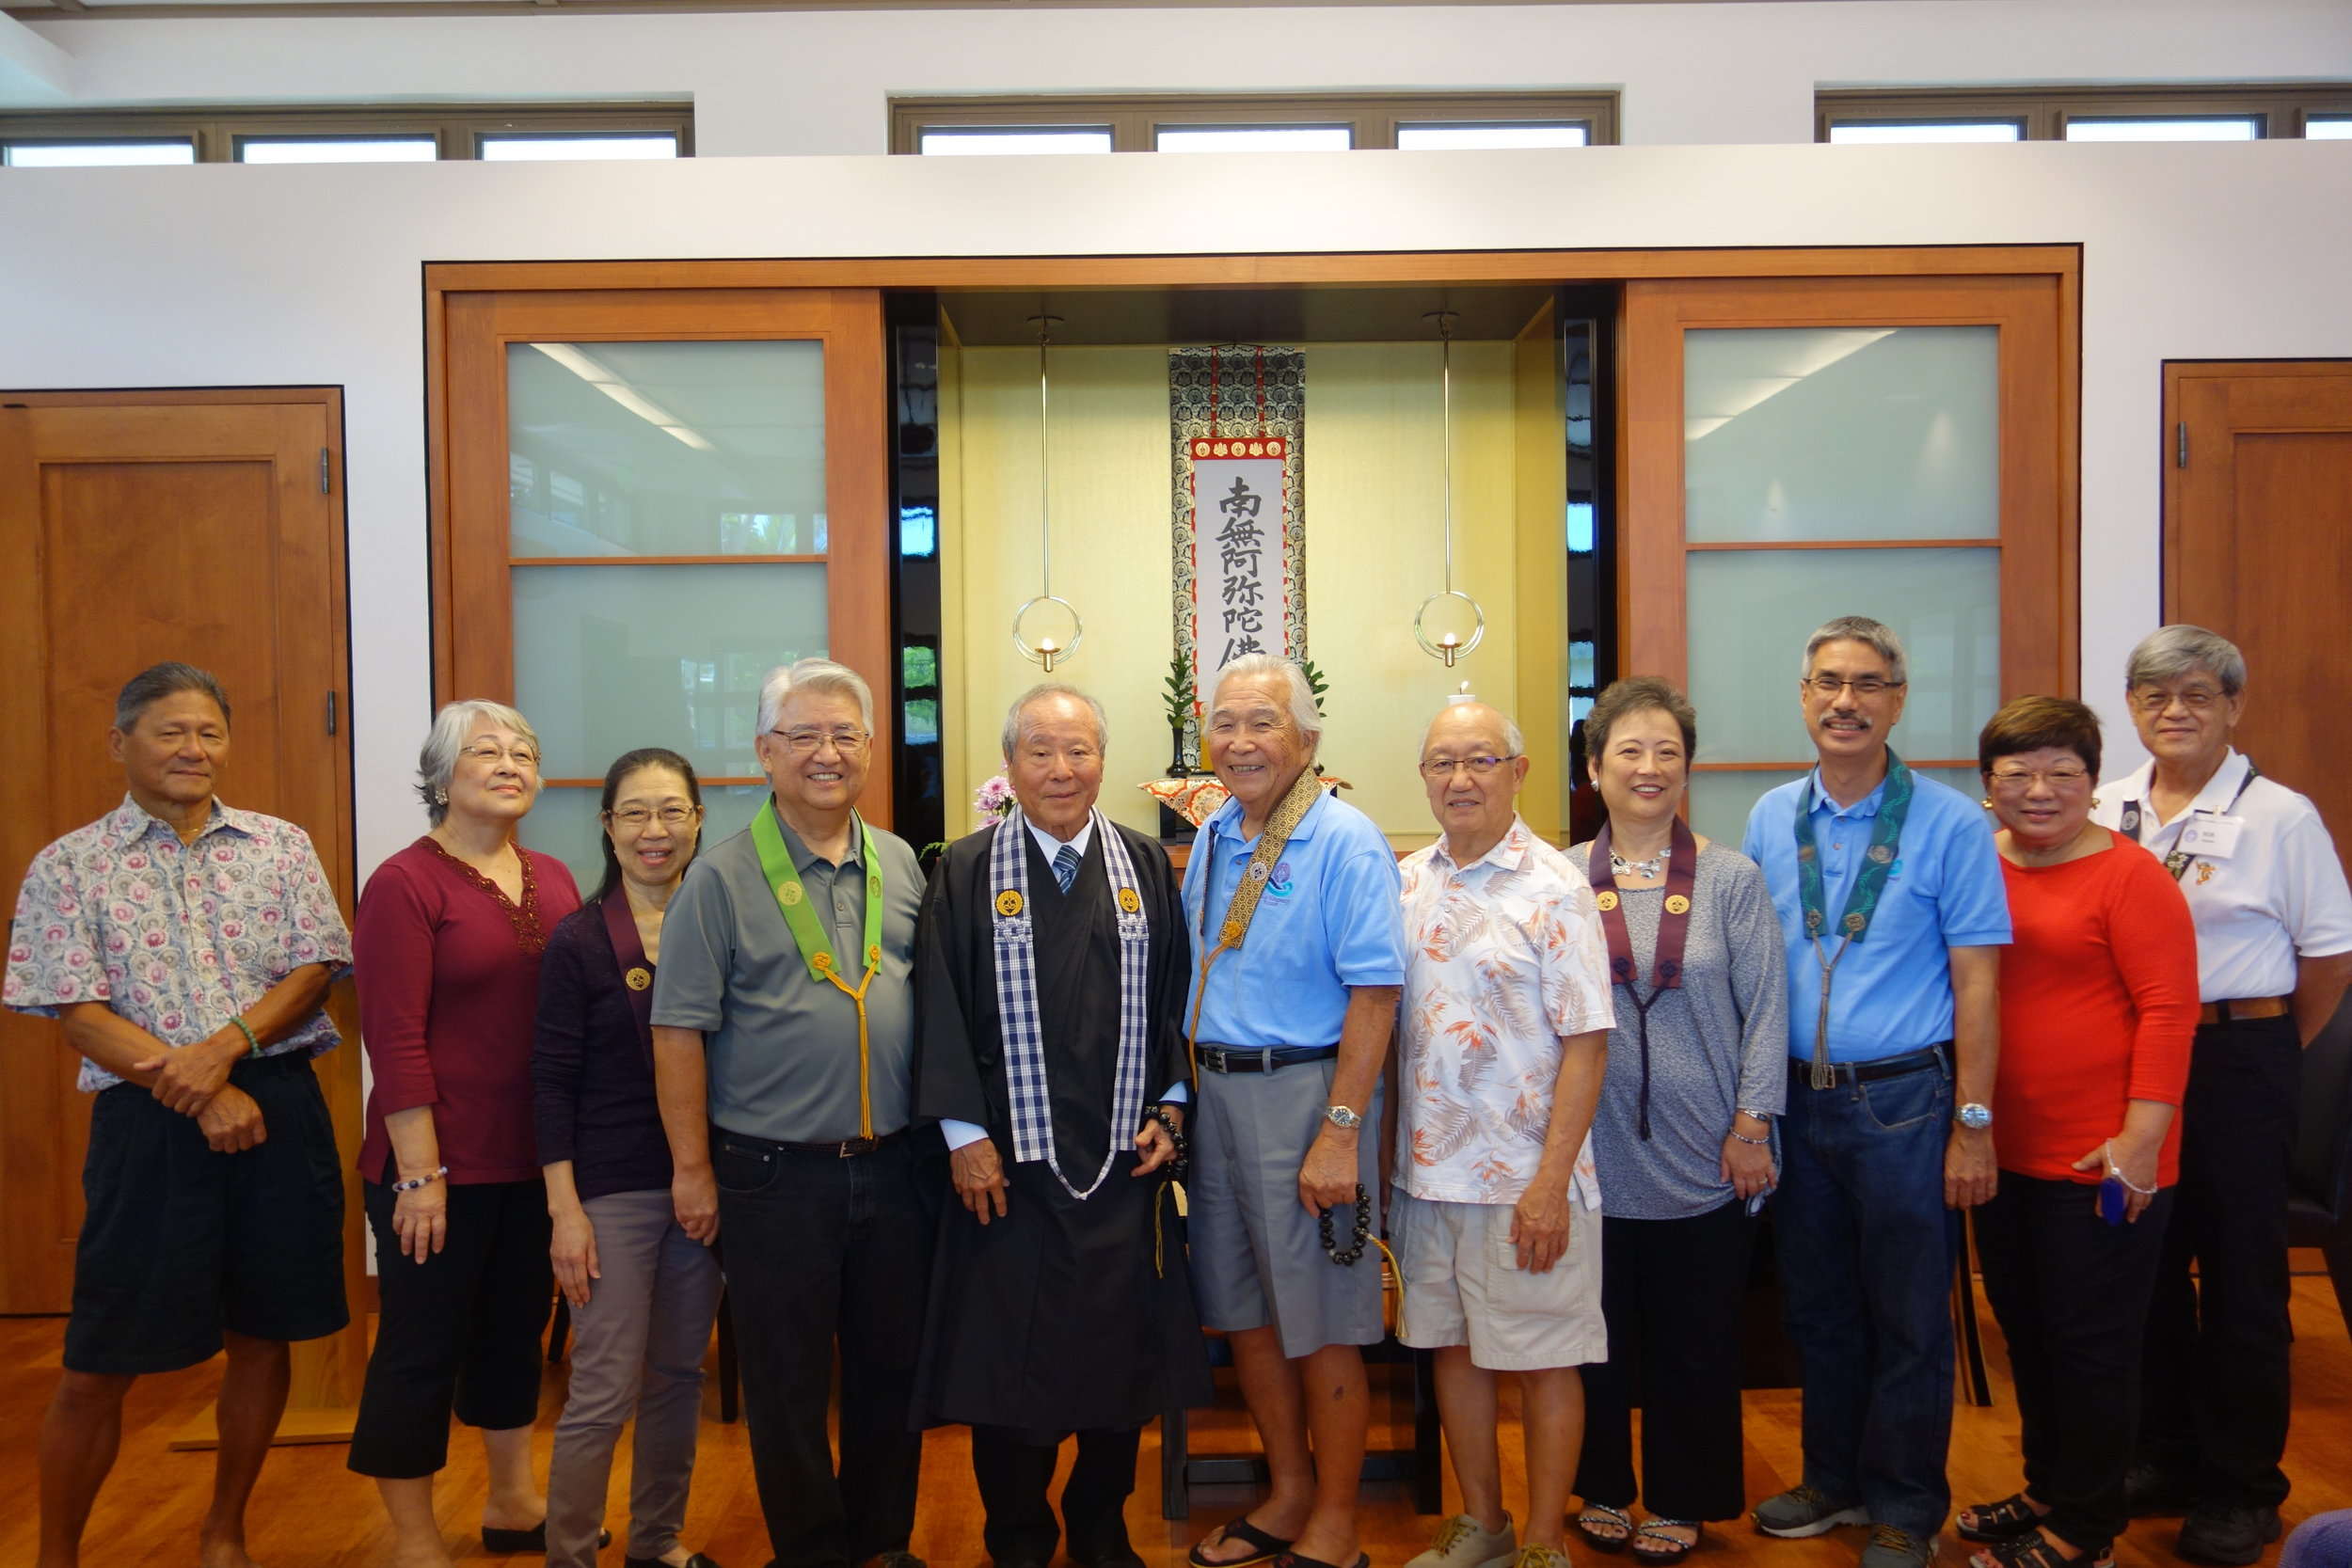 From left to right: Gary Yamamoto, Jean Fukumoto, Joyce Nishita, Dennis Tashiro, Rev. David Nakamoto, Keiji Kukino, Allen Kusano, Merle Tashiro, Gerald Matsuda, Prudence Kusano, Bob Nishita. Not pictured: Joy Nishida